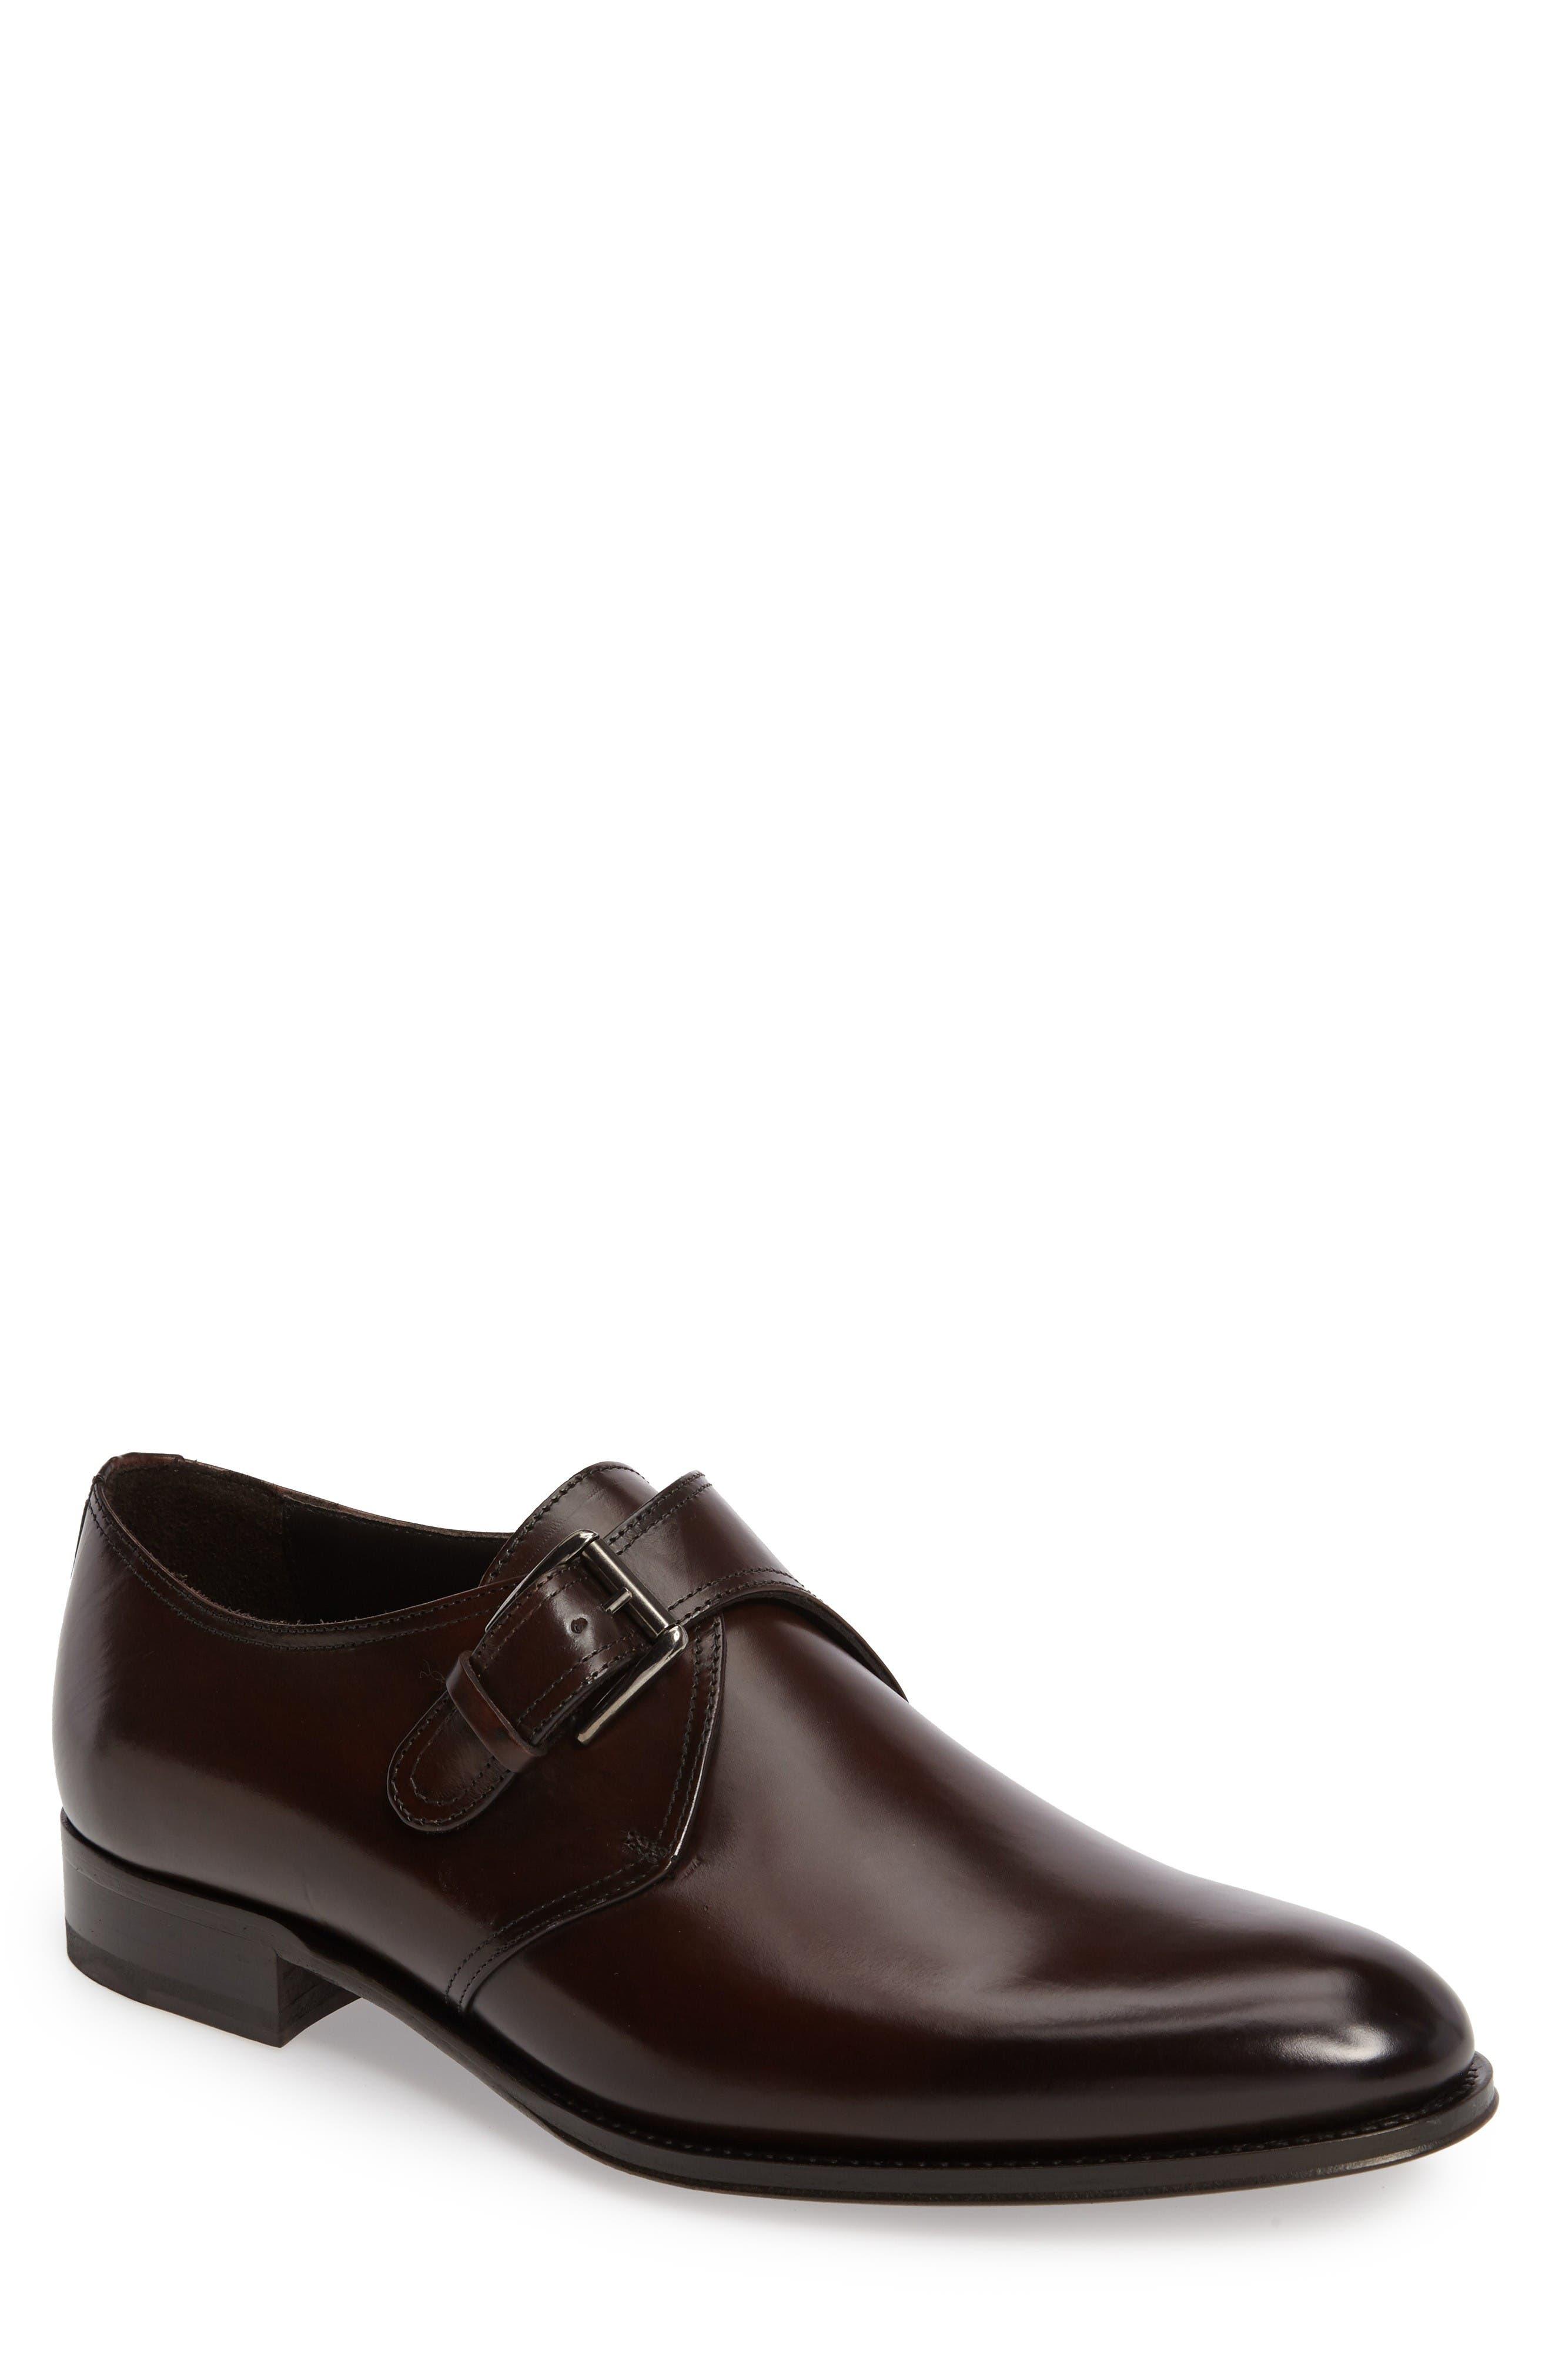 Main Image - To Boot New York Emmett Monk Strap Shoe (Men)